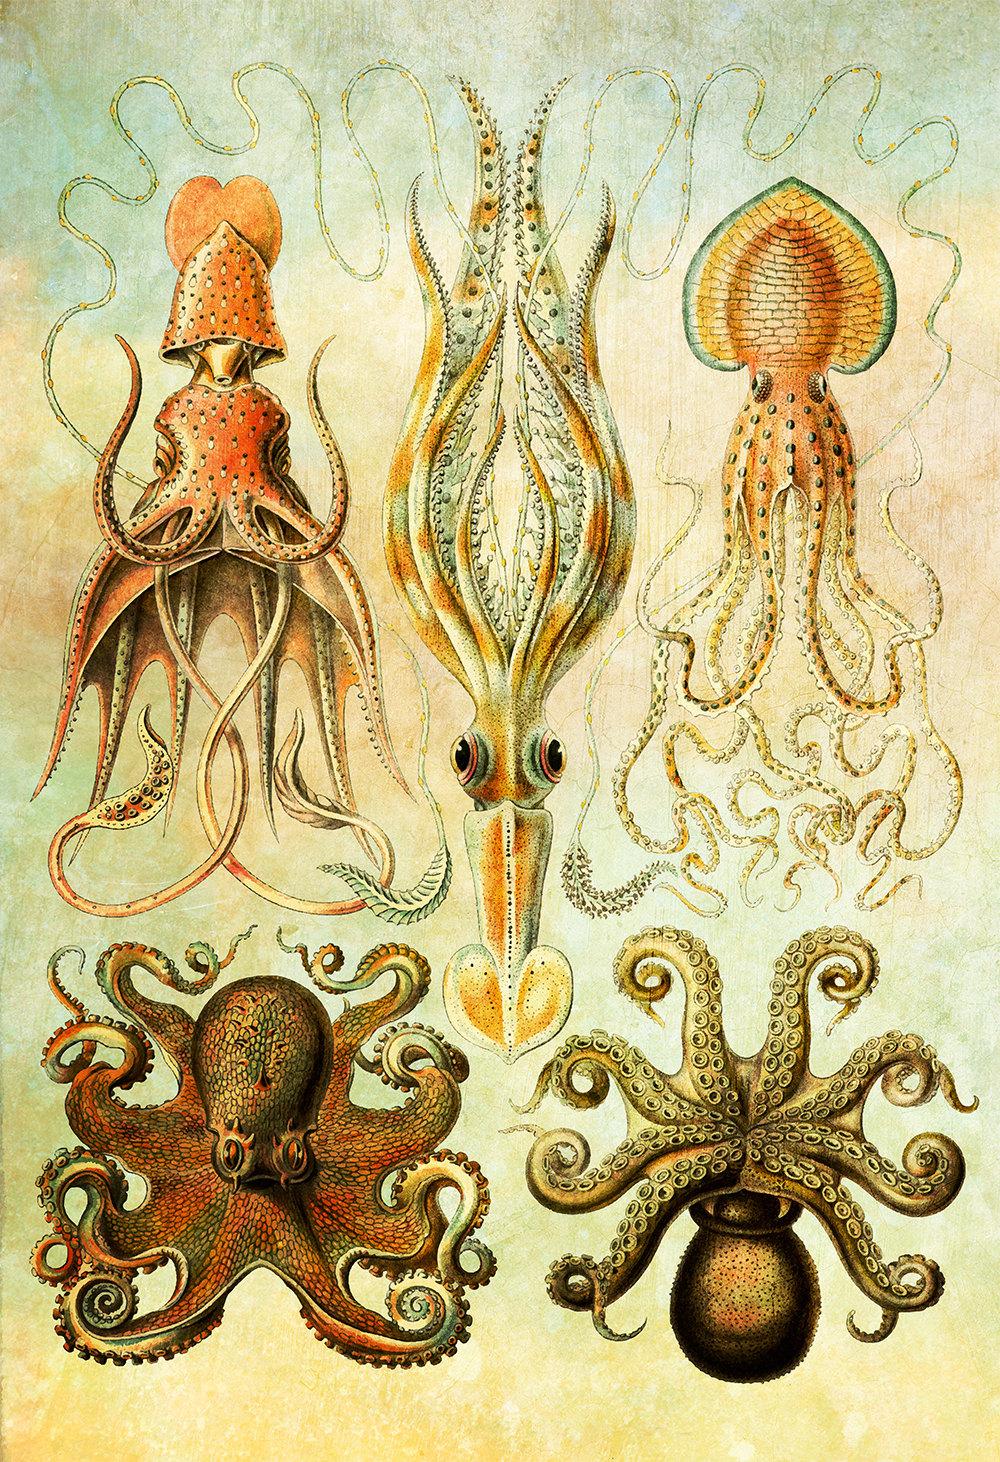 Ernst Haeckel Gamochonia Print Octopus and Squid Art Vintage ...